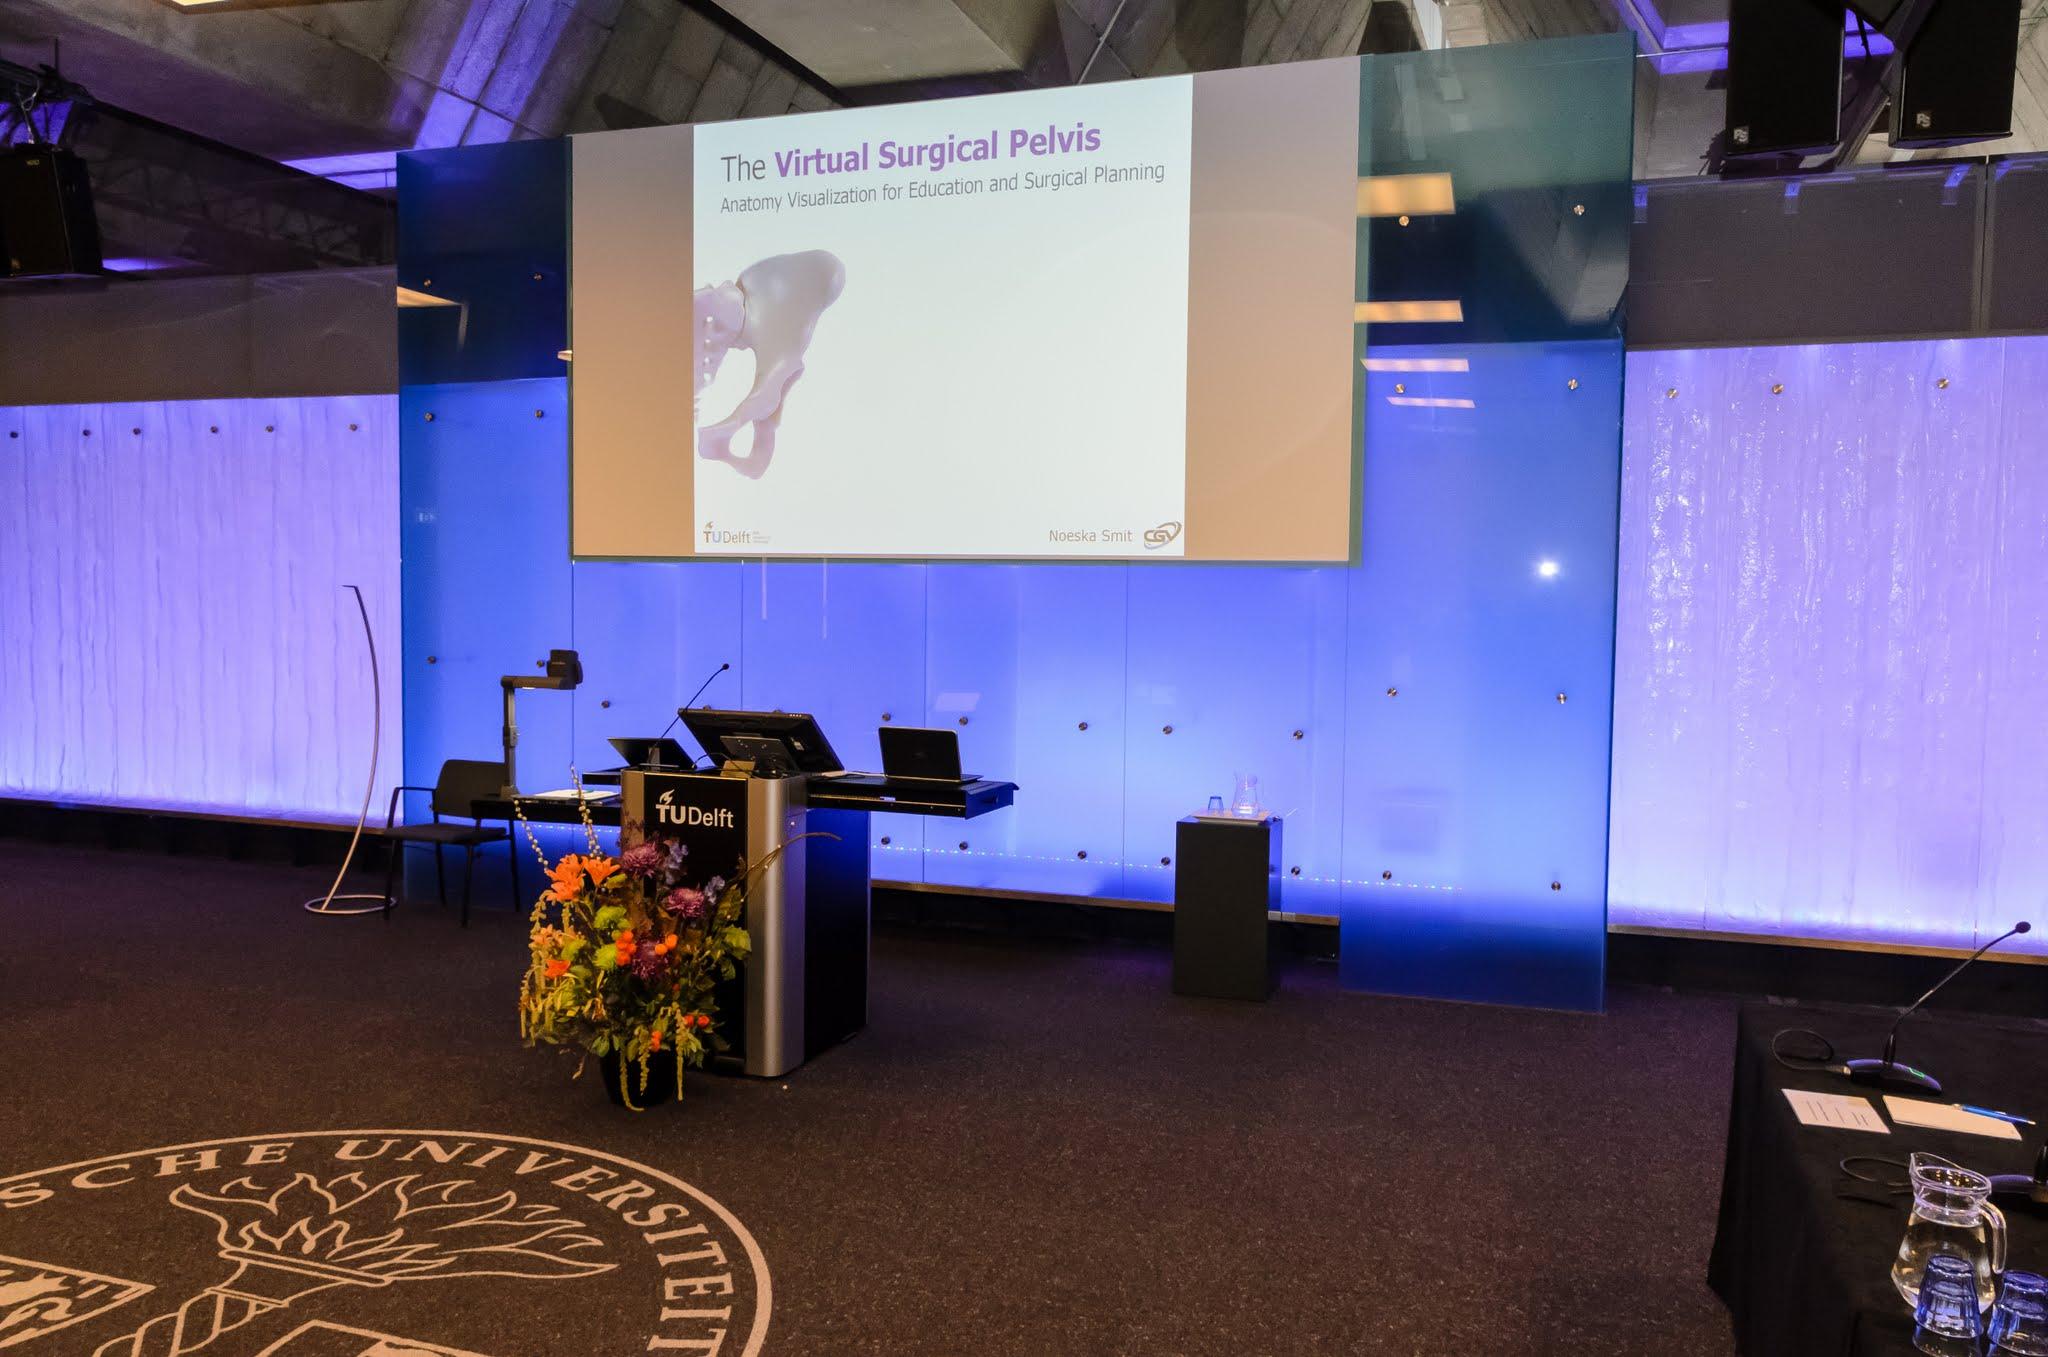 The venue: Senaatszaal at the TU Delft Aula